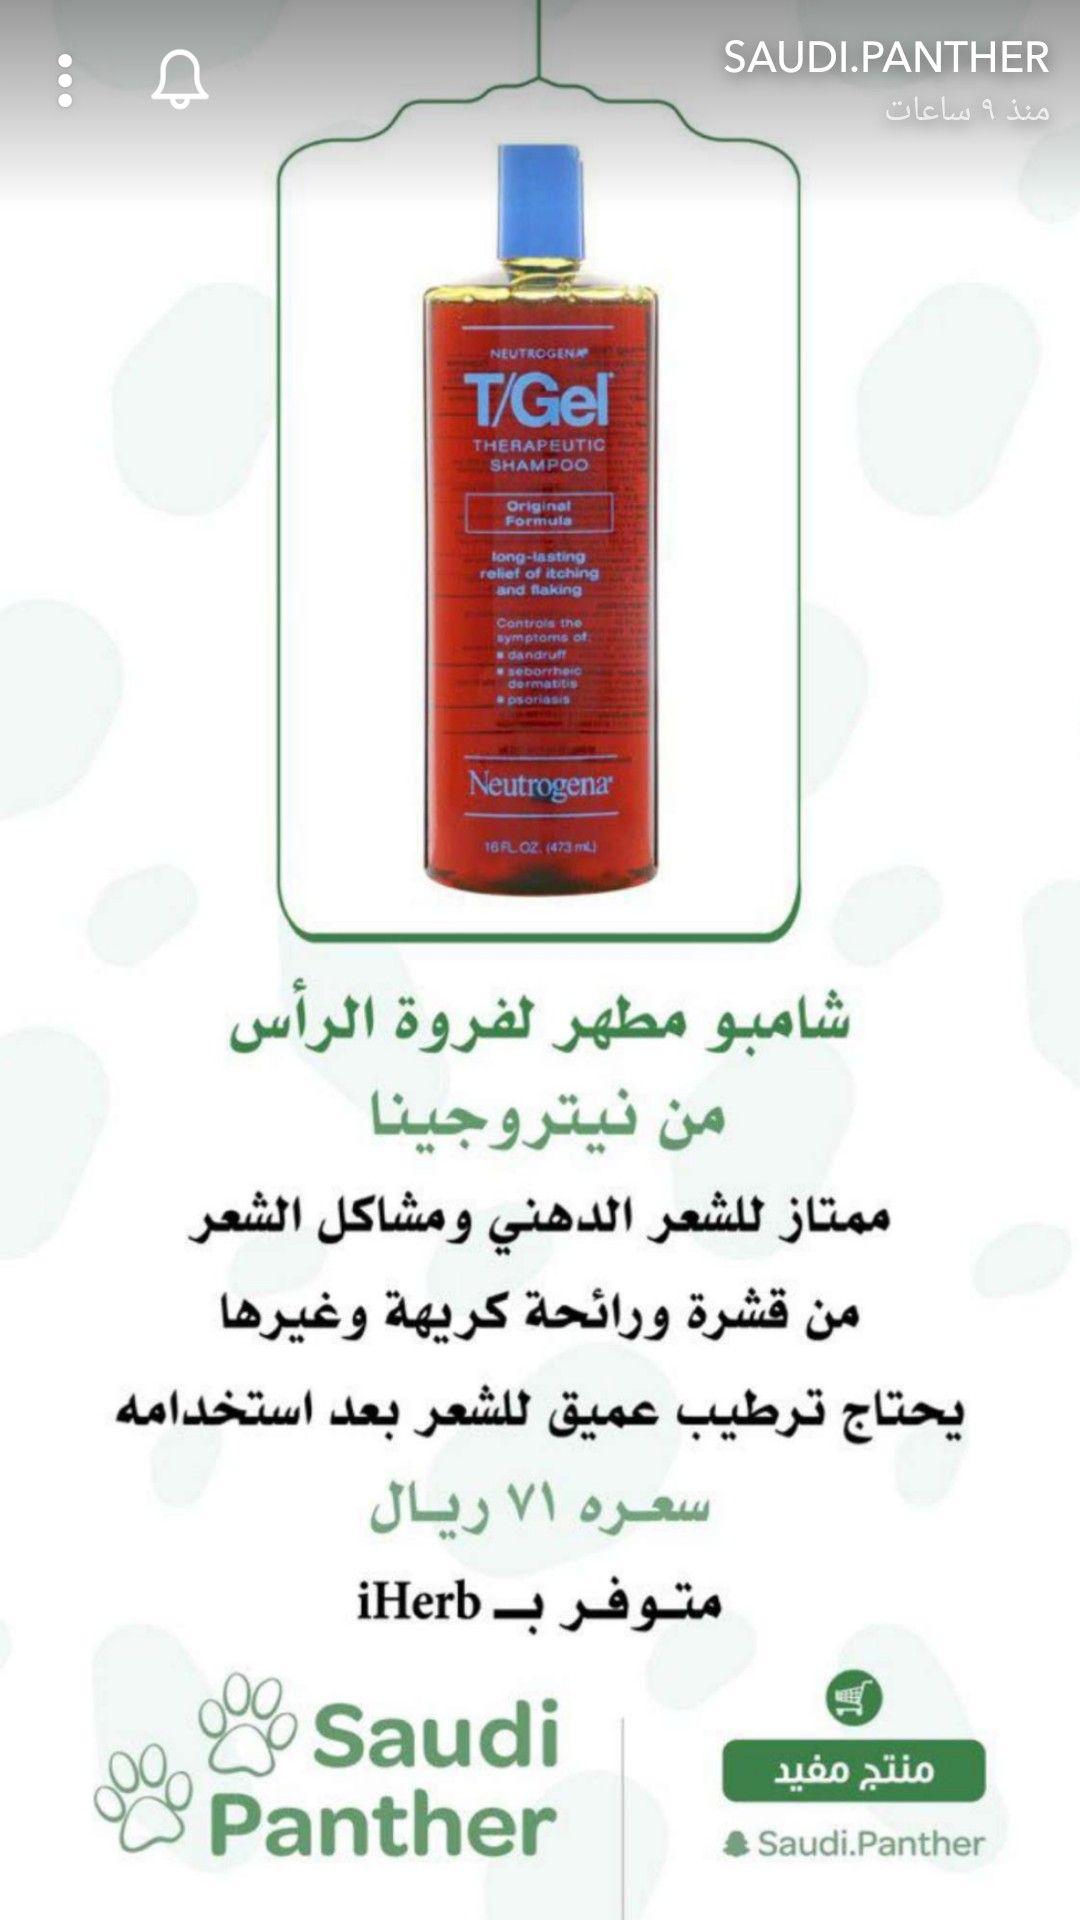 Pin By Raneem On عنايتي Beauty Skin Care Routine T Gel Beauty Skin Care